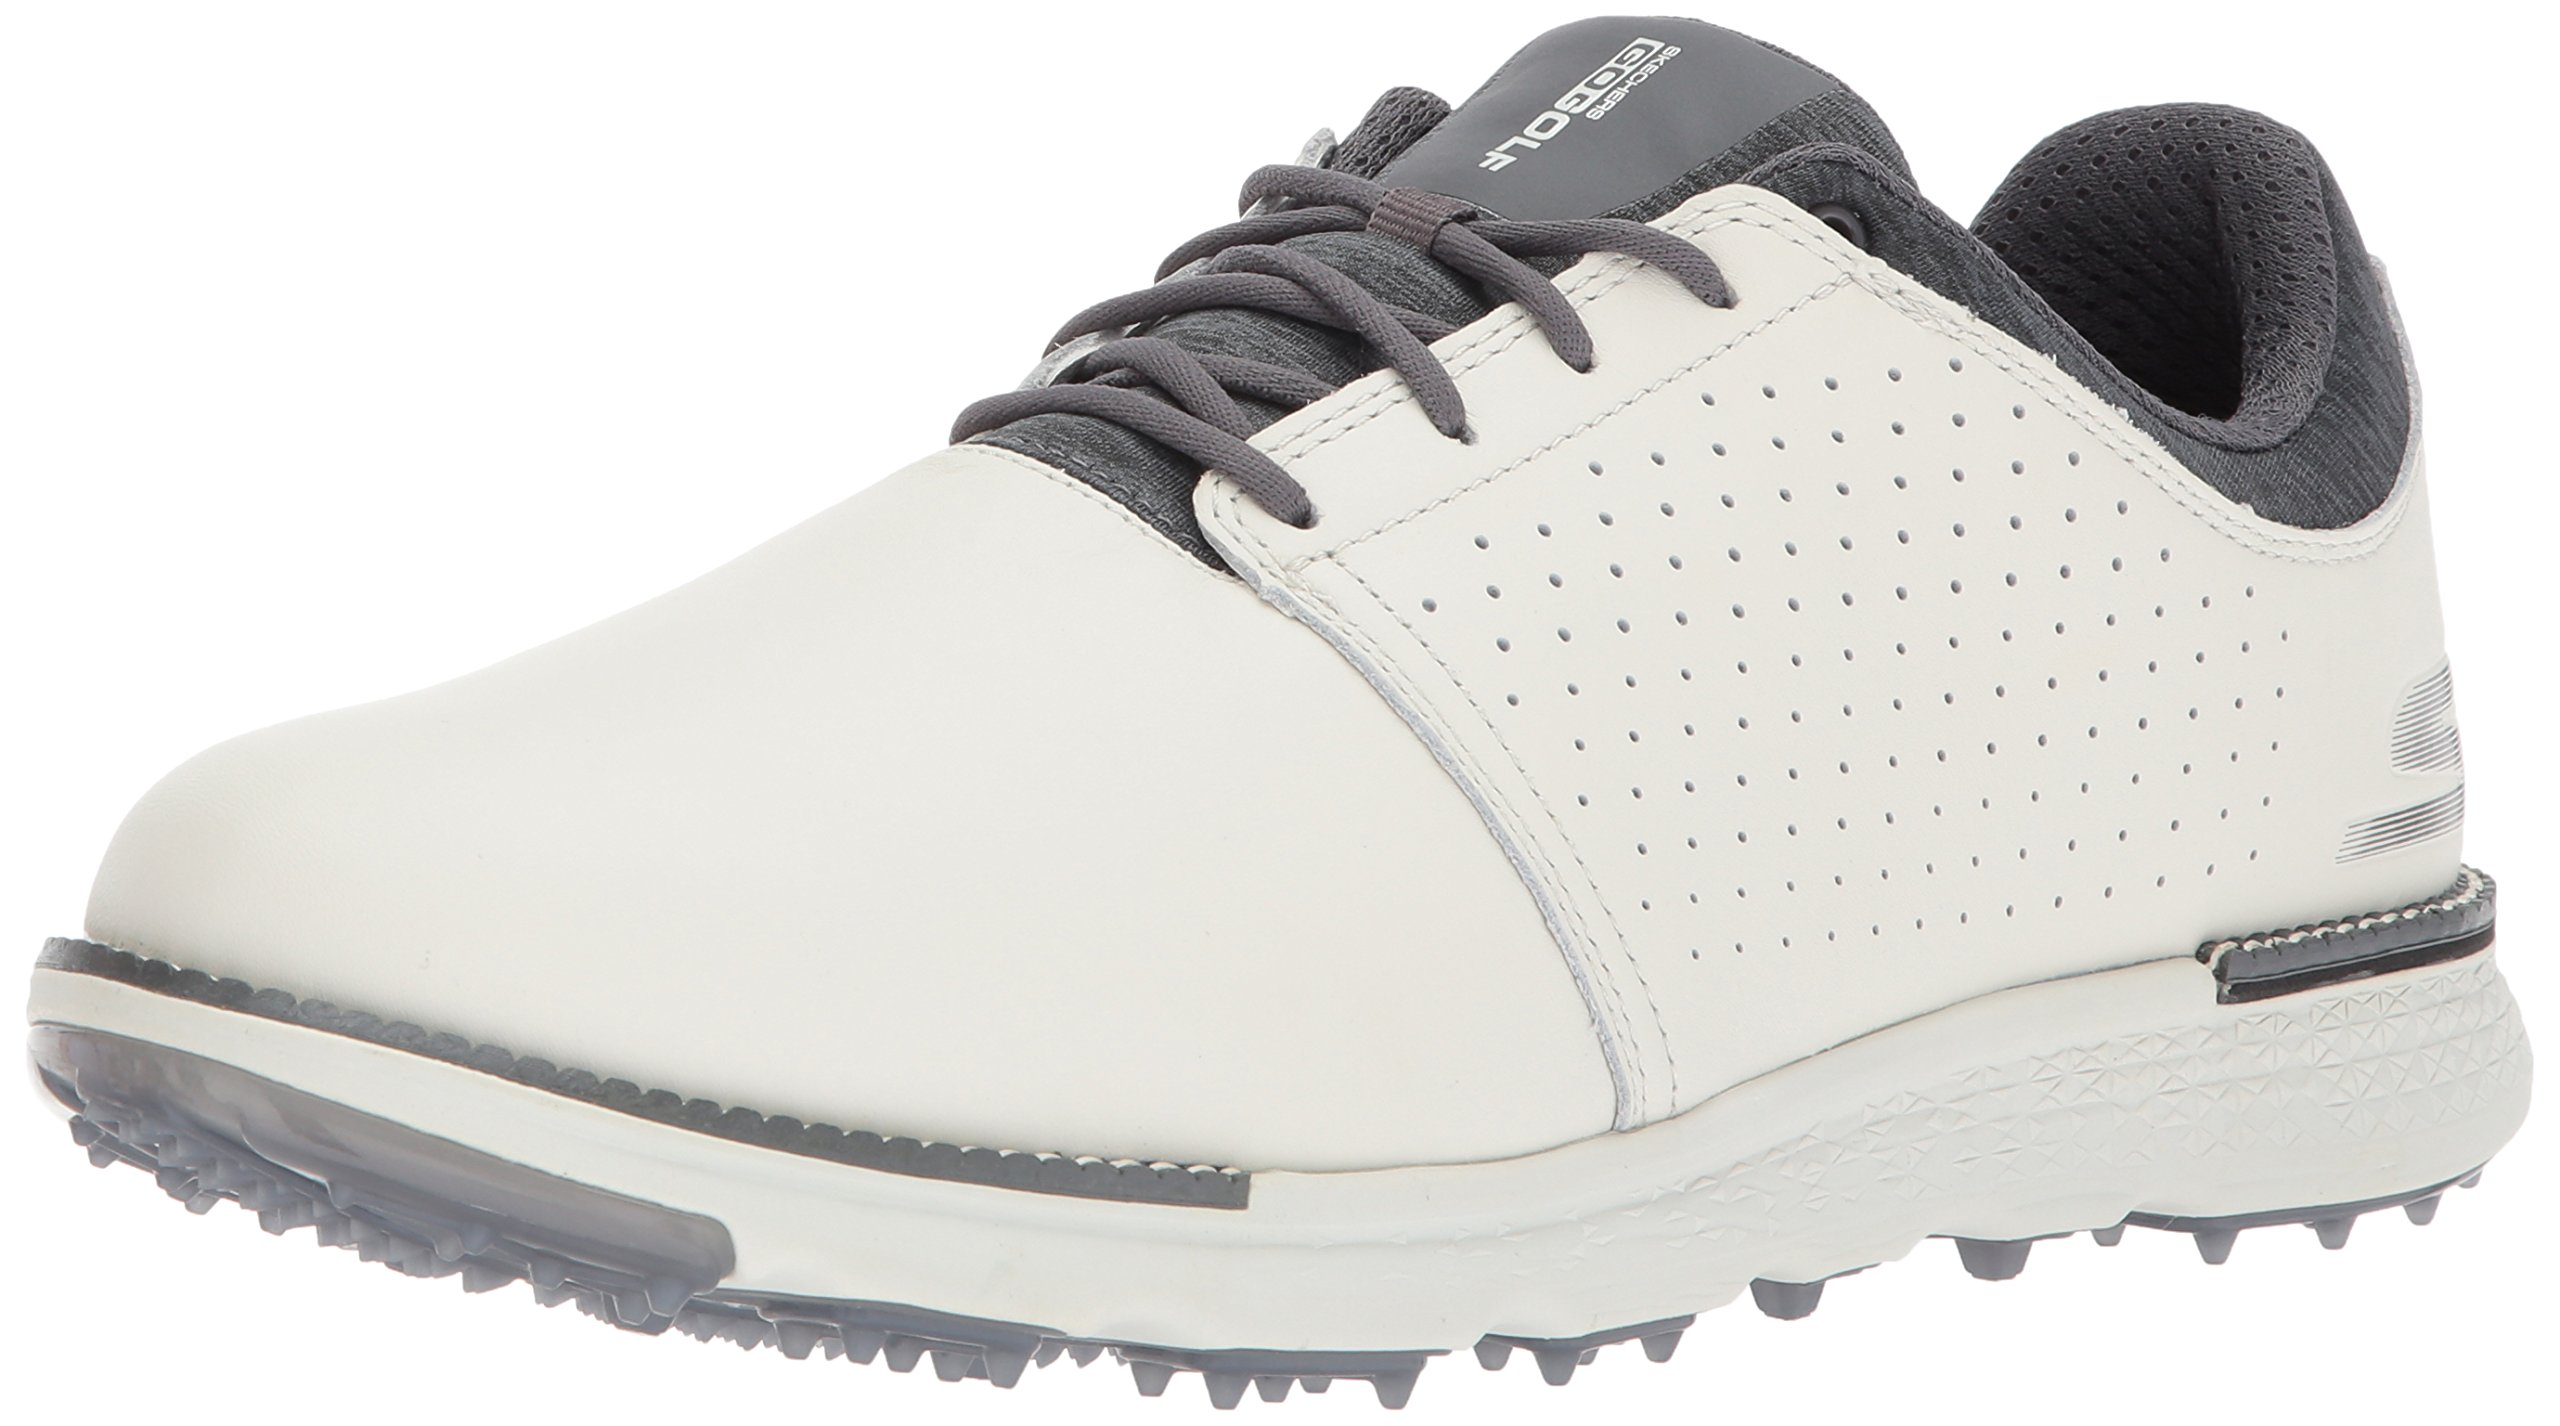 Skechers Performance Men's Go Golf Elite 3 Approach Lx Golf Shoe,Natural/Gray,13 M US